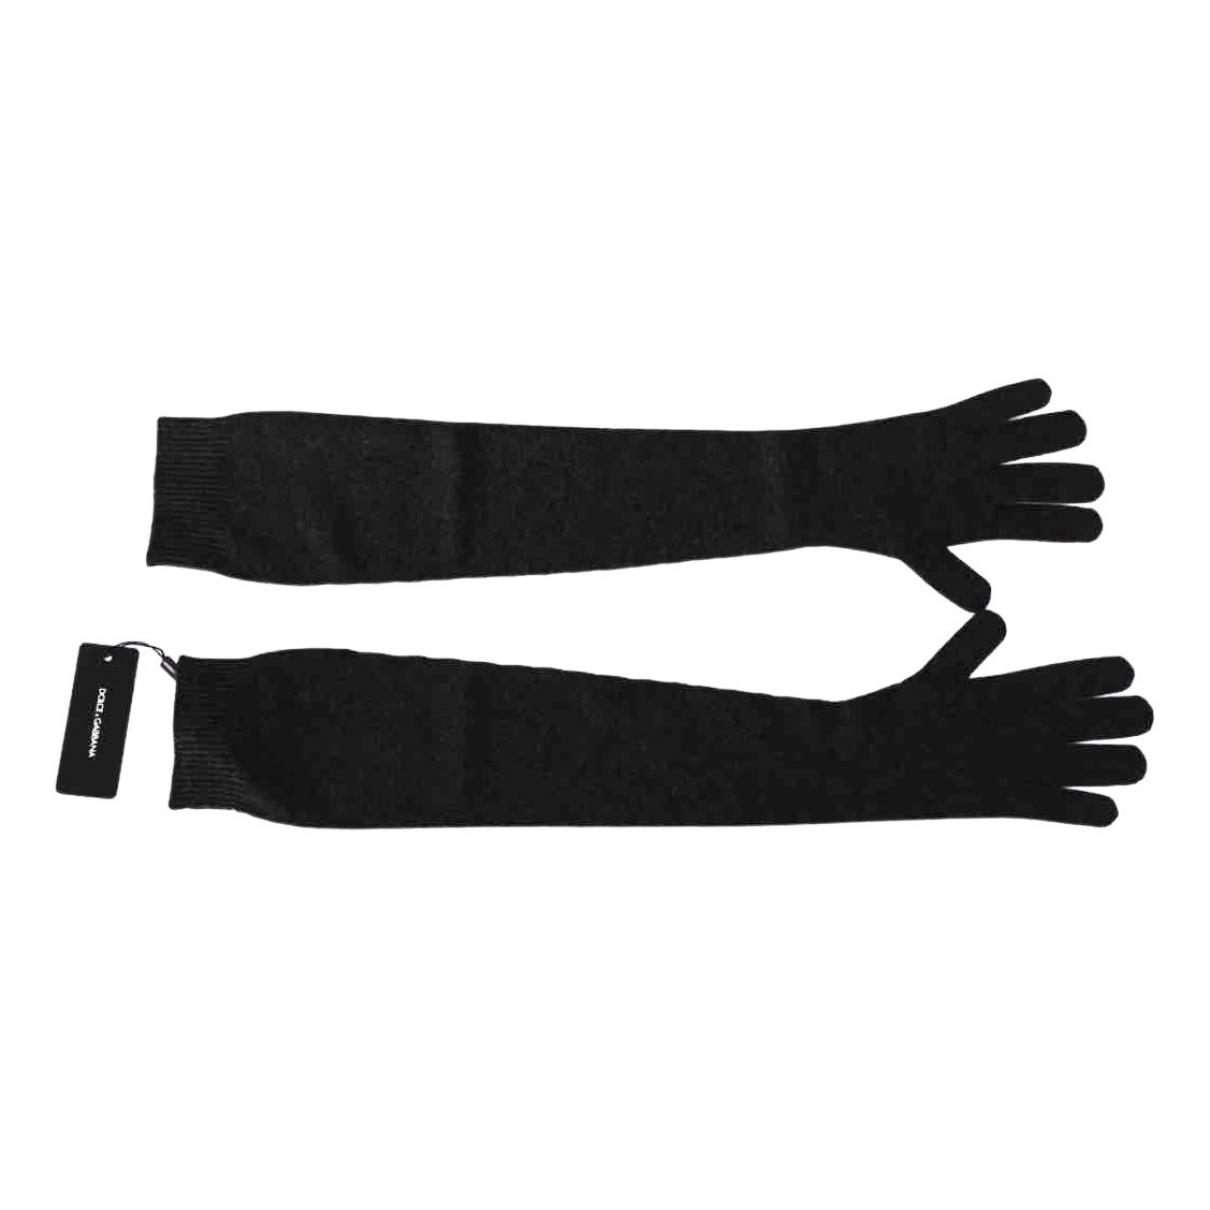 Dolce & Gabbana \N Handschuhe in  Schwarz Kaschmir